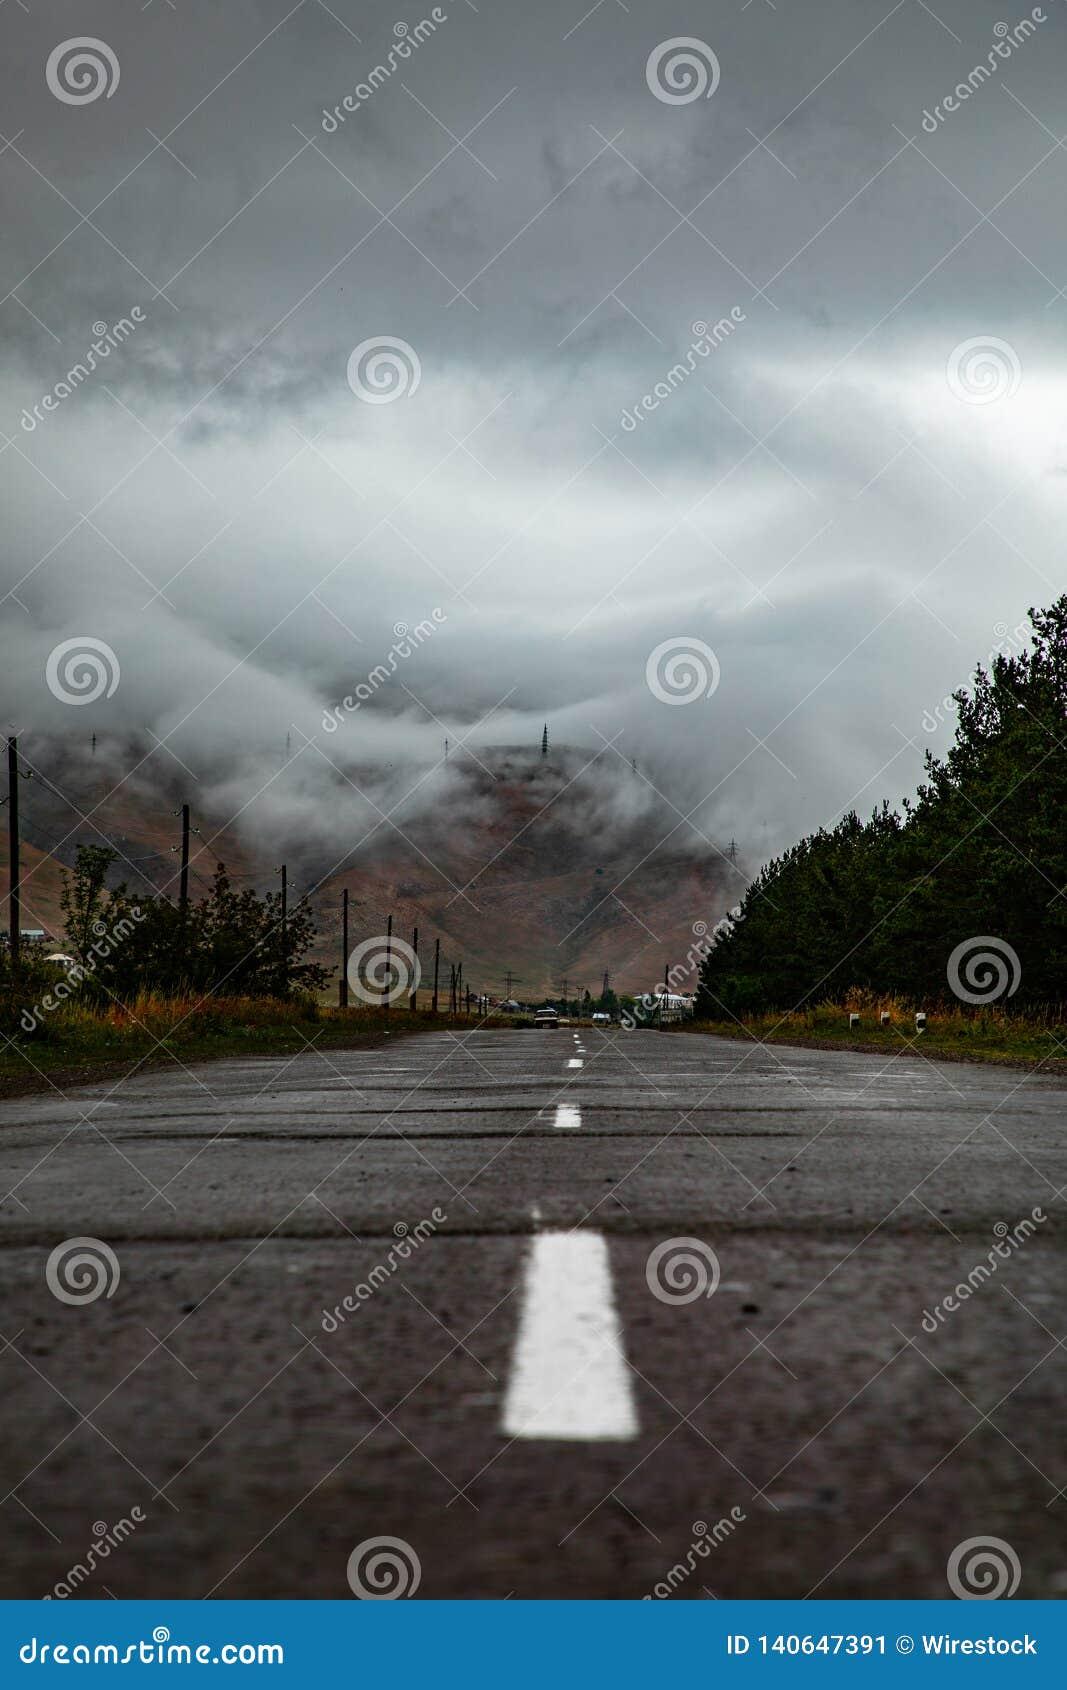 A road through clouds